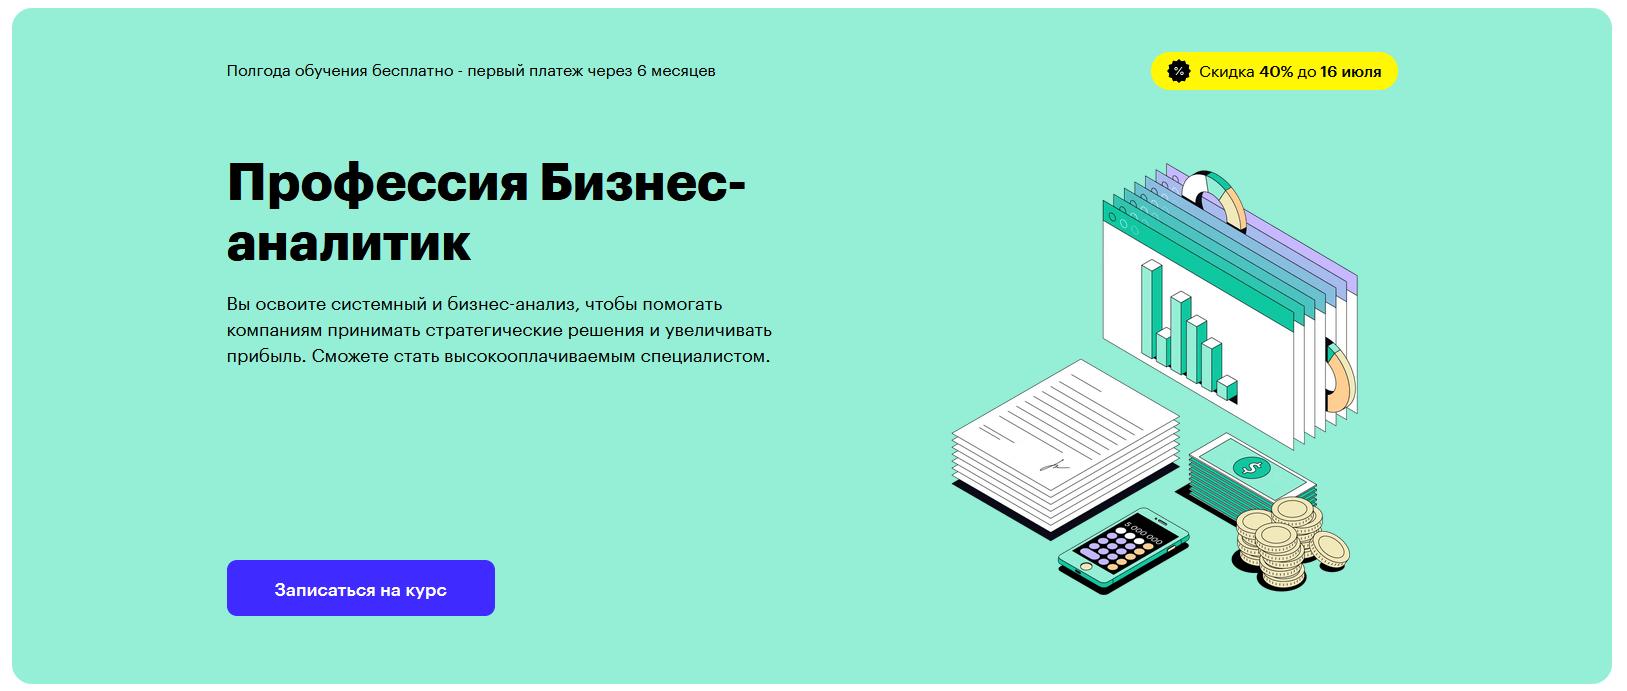 Professiya-Biznes-analitik_-obuchenie-na-biznes-analitika-onlajn